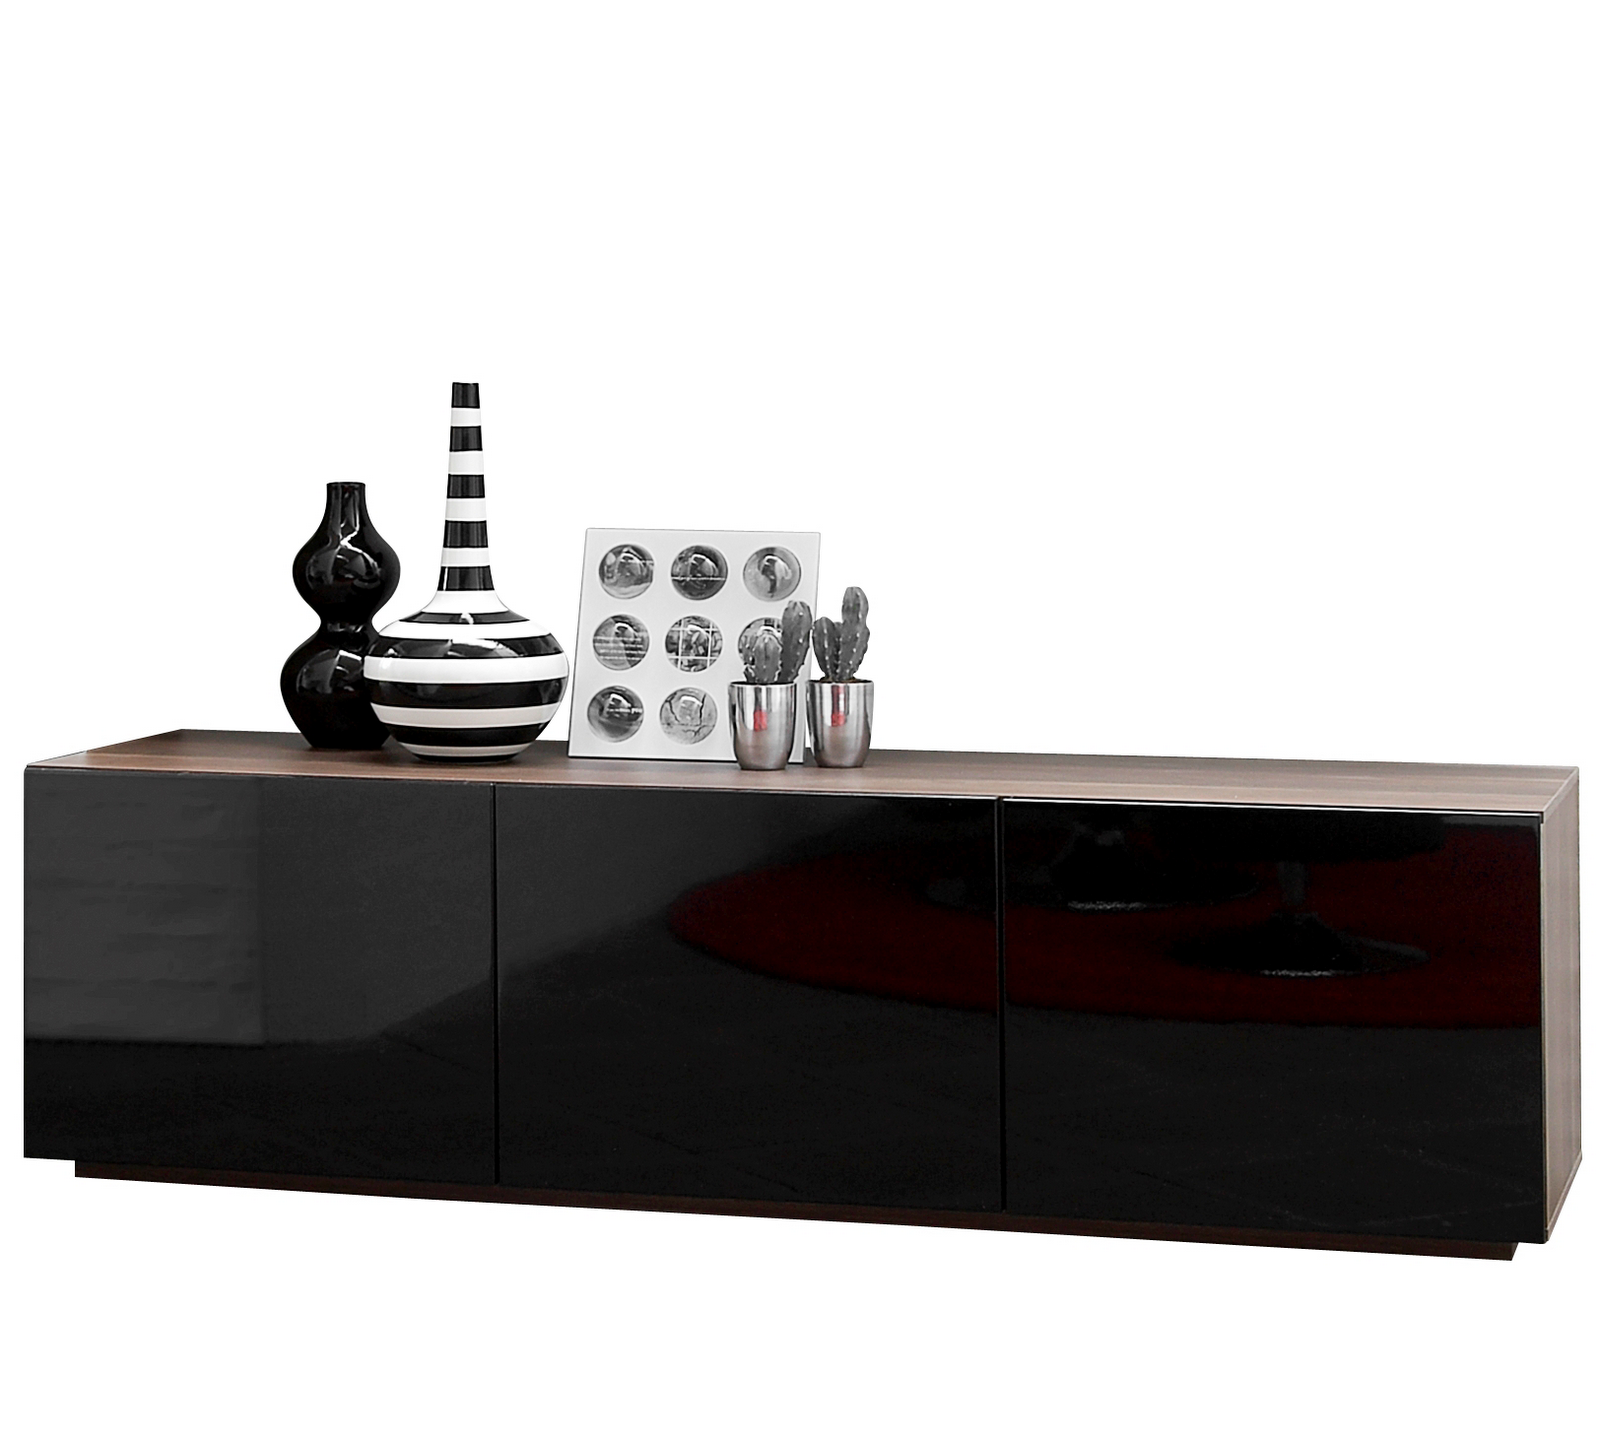 Maison21 decorative but not serious tvilum high - Tvilum sideboard ...